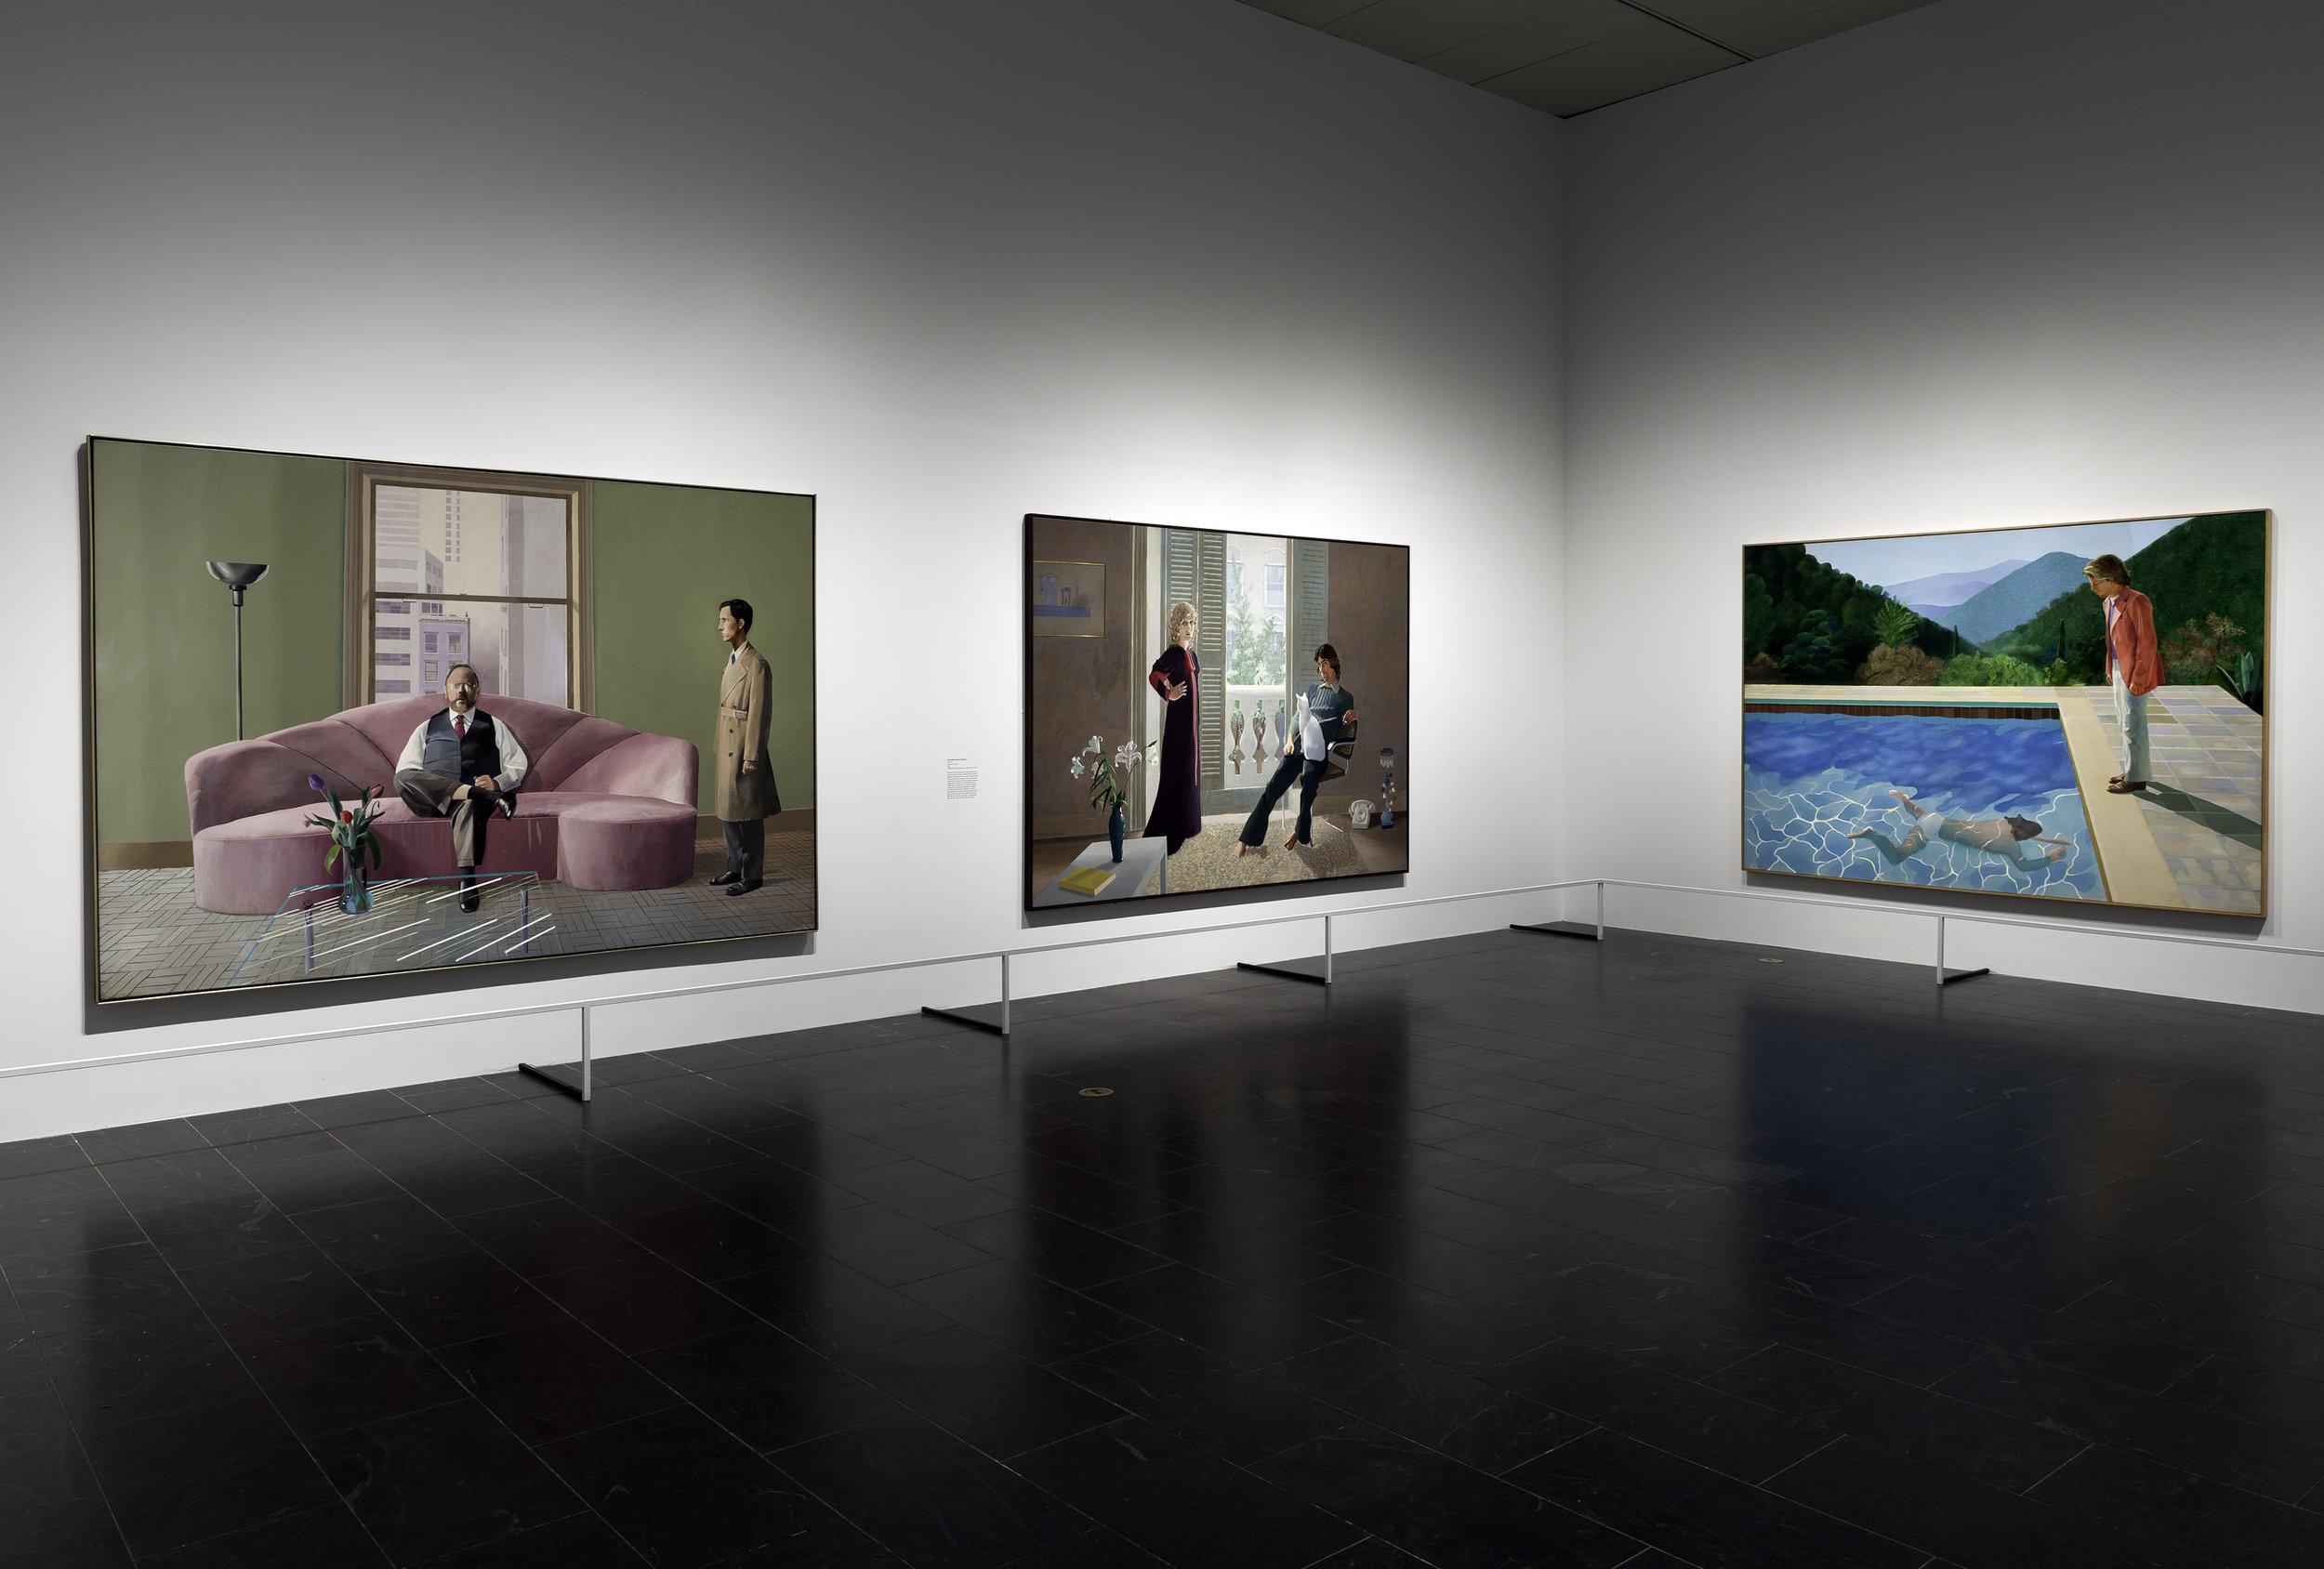 26.+David+Hockney,+Gallery+4,+Pair+Portraits.jpg